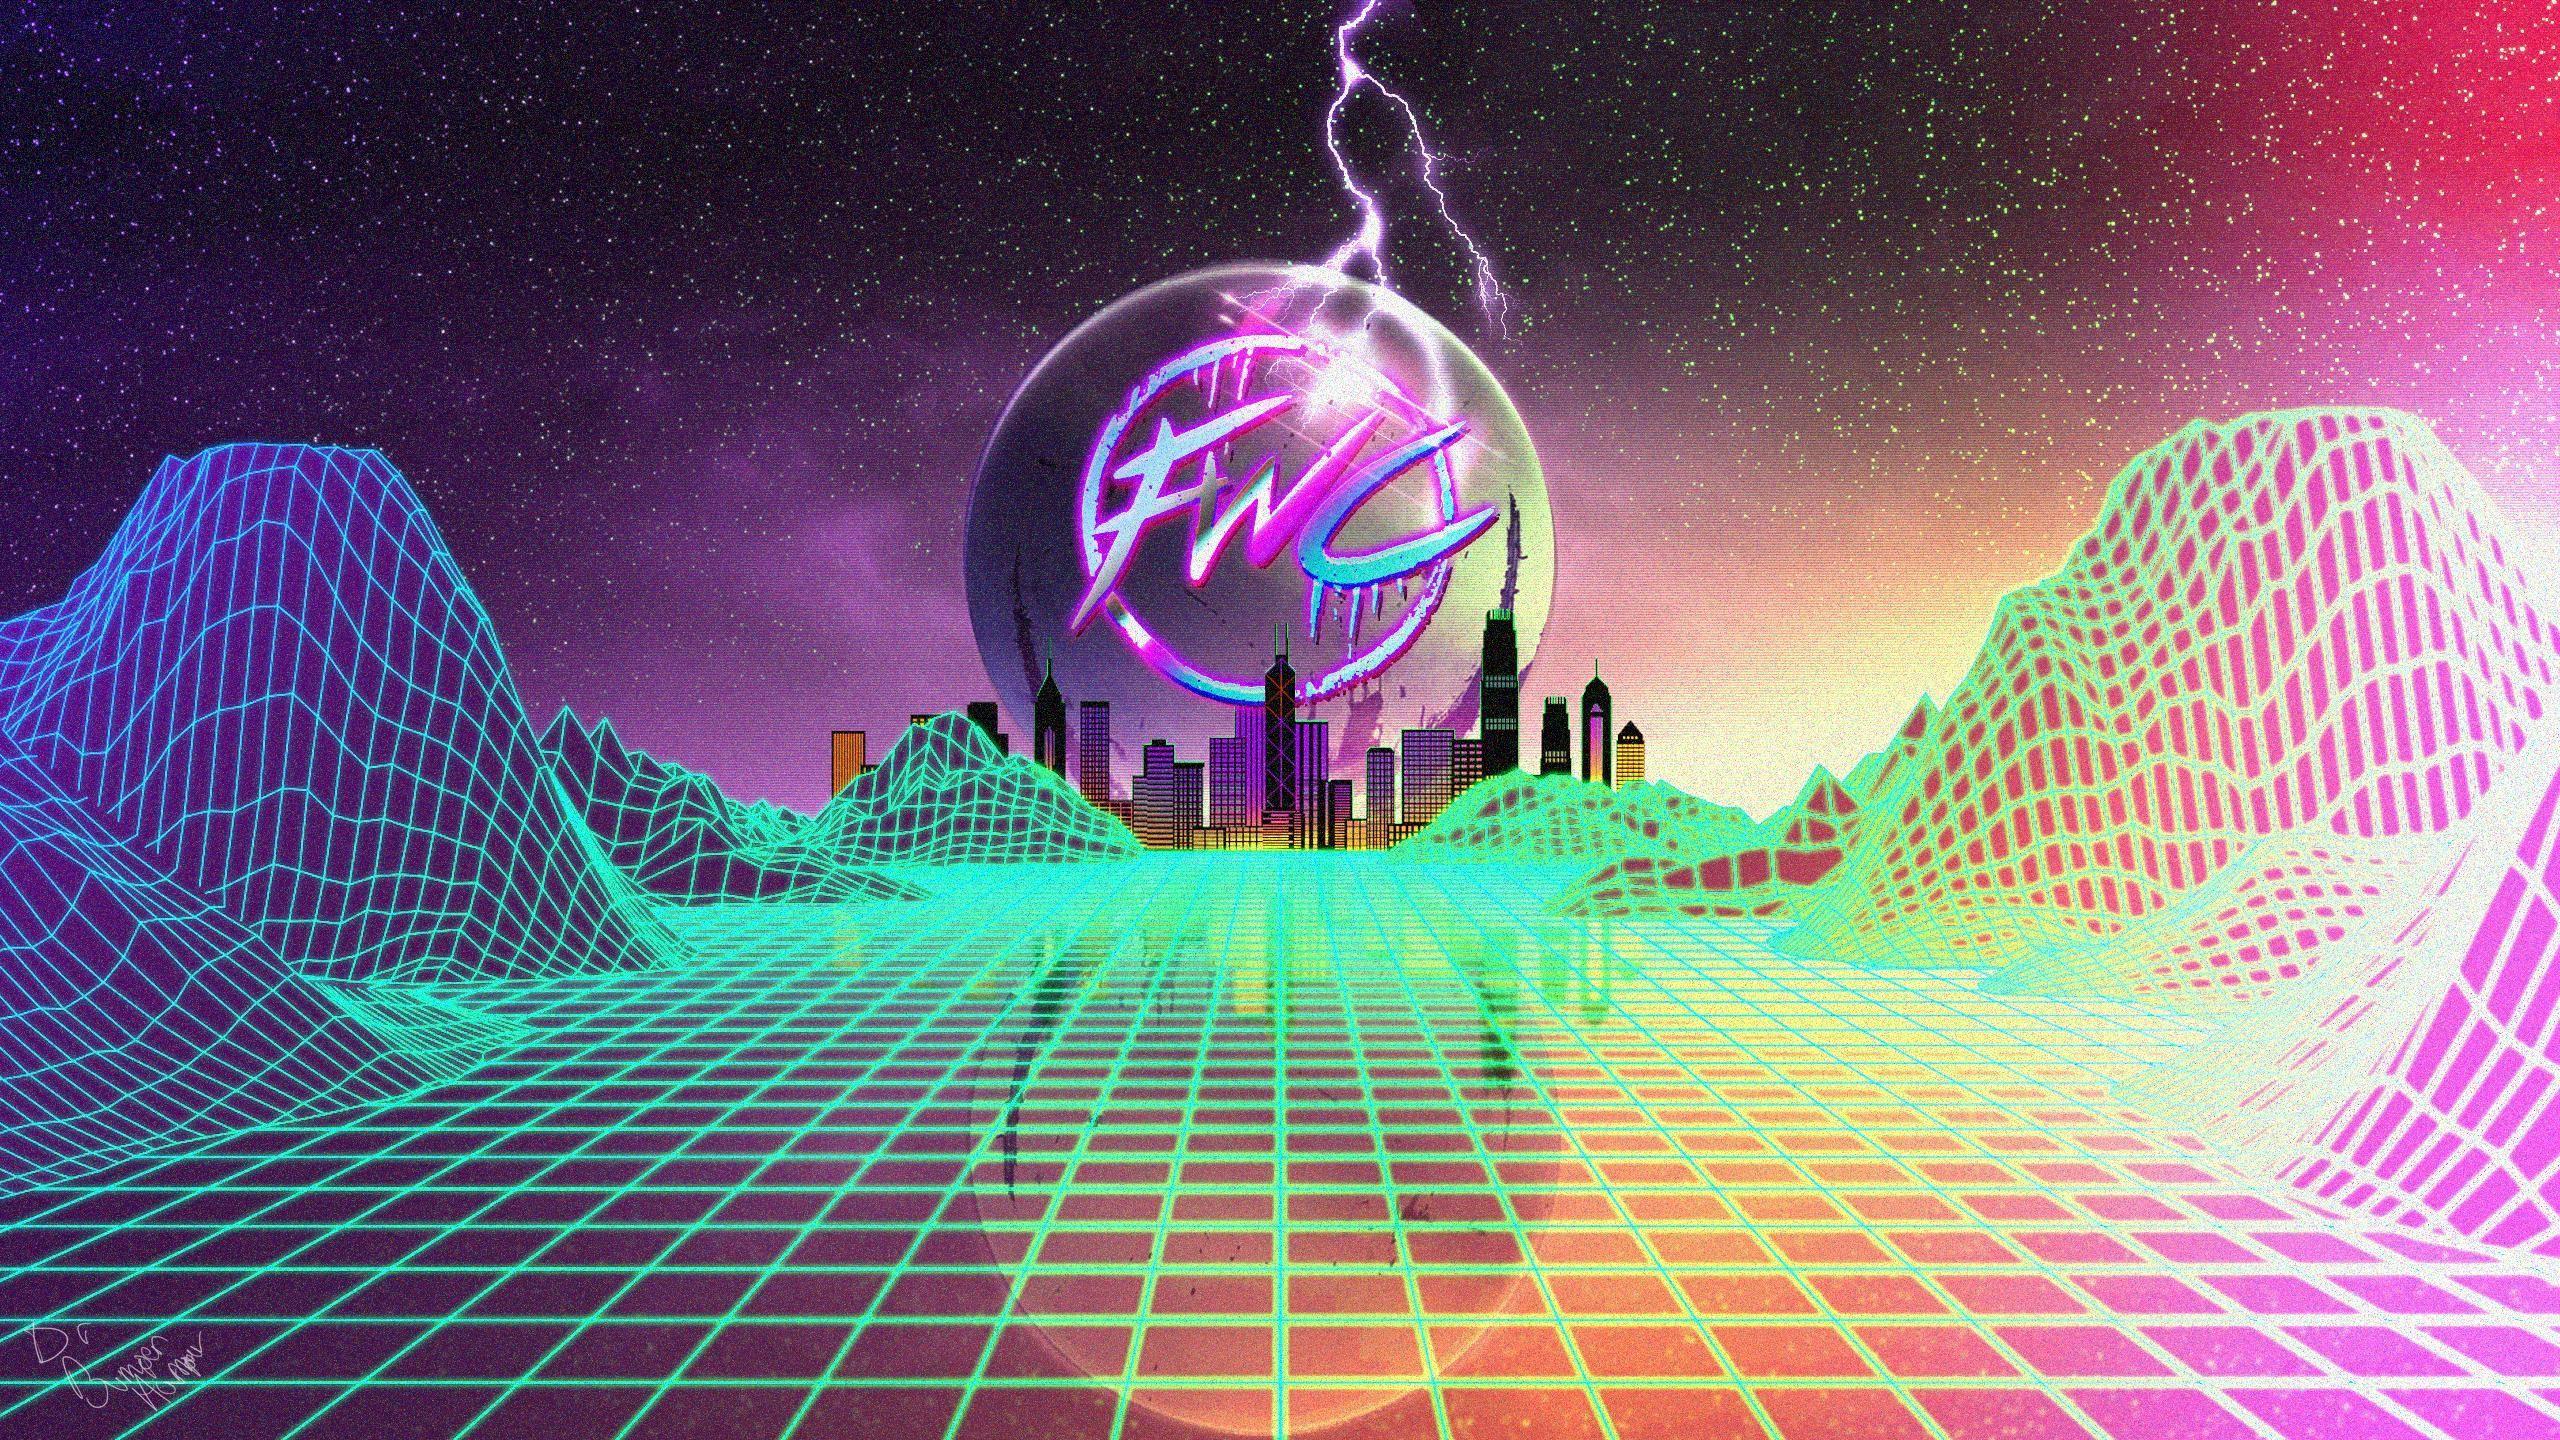 Pin by Woff Banazeraf on Aesthetic | Vaporwave wallpaper, Vaporwave, Glitch wallpaper